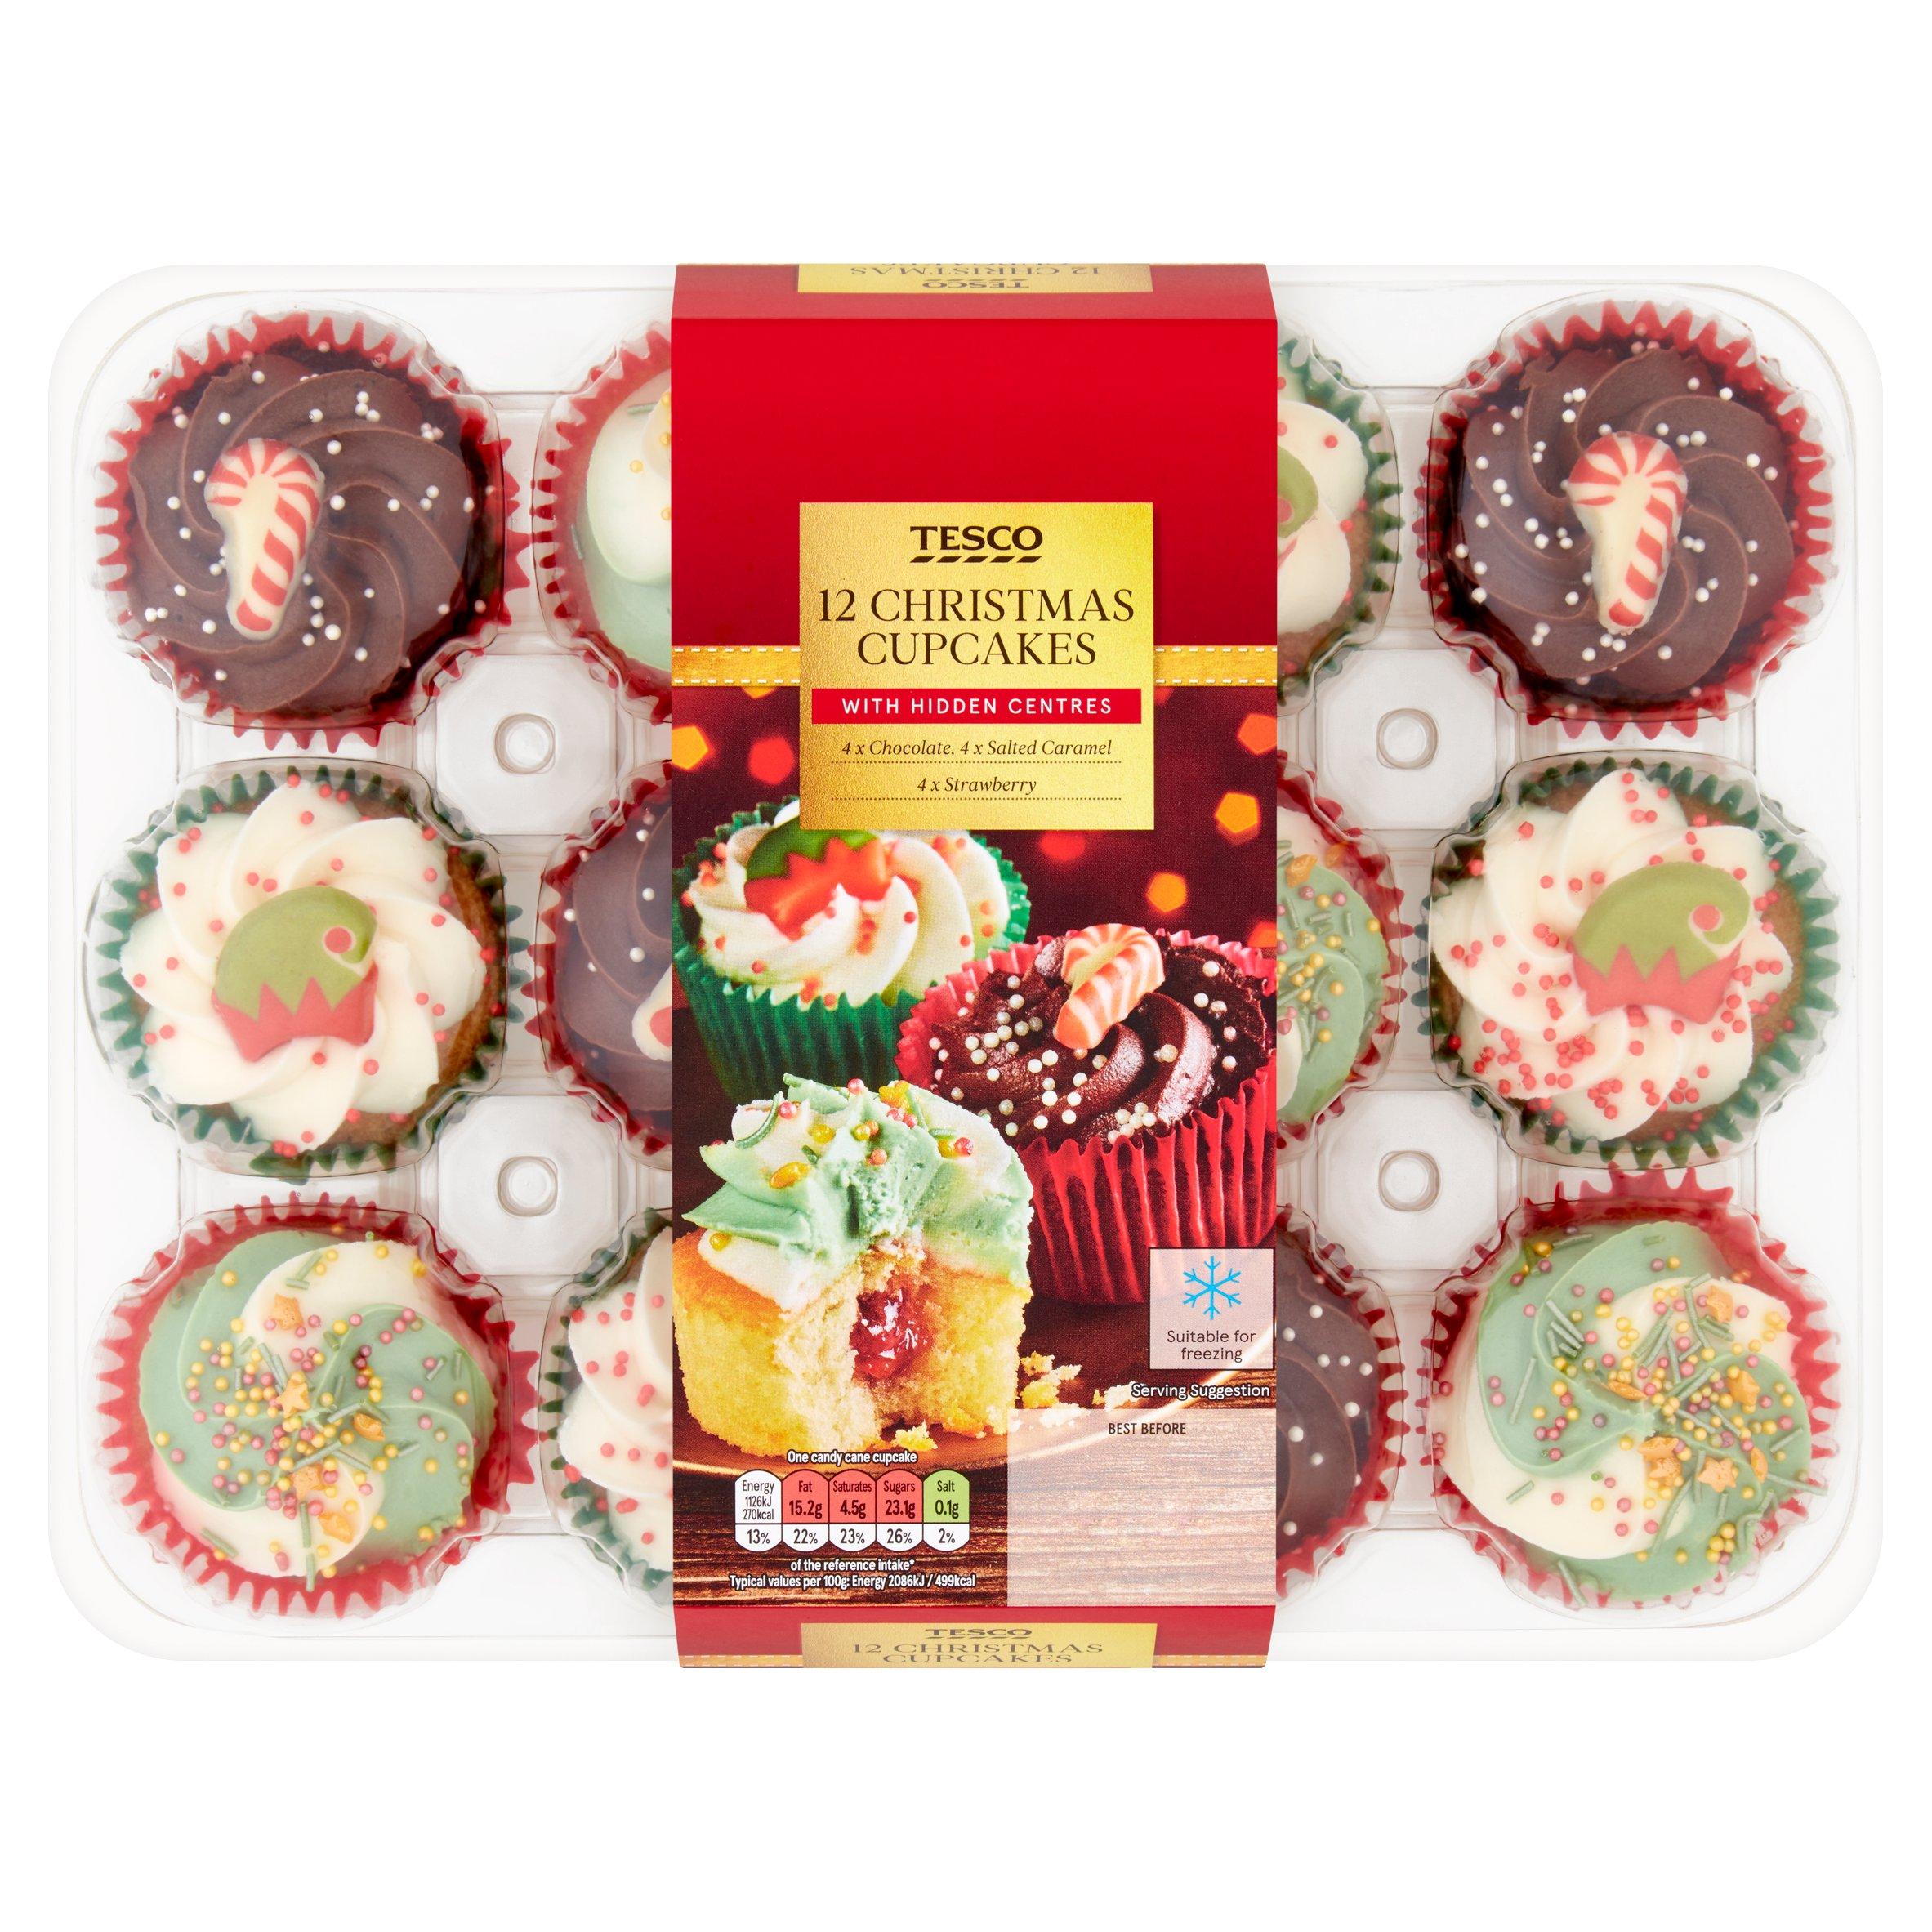 Tesco 12 Christmas Cupcake Platter